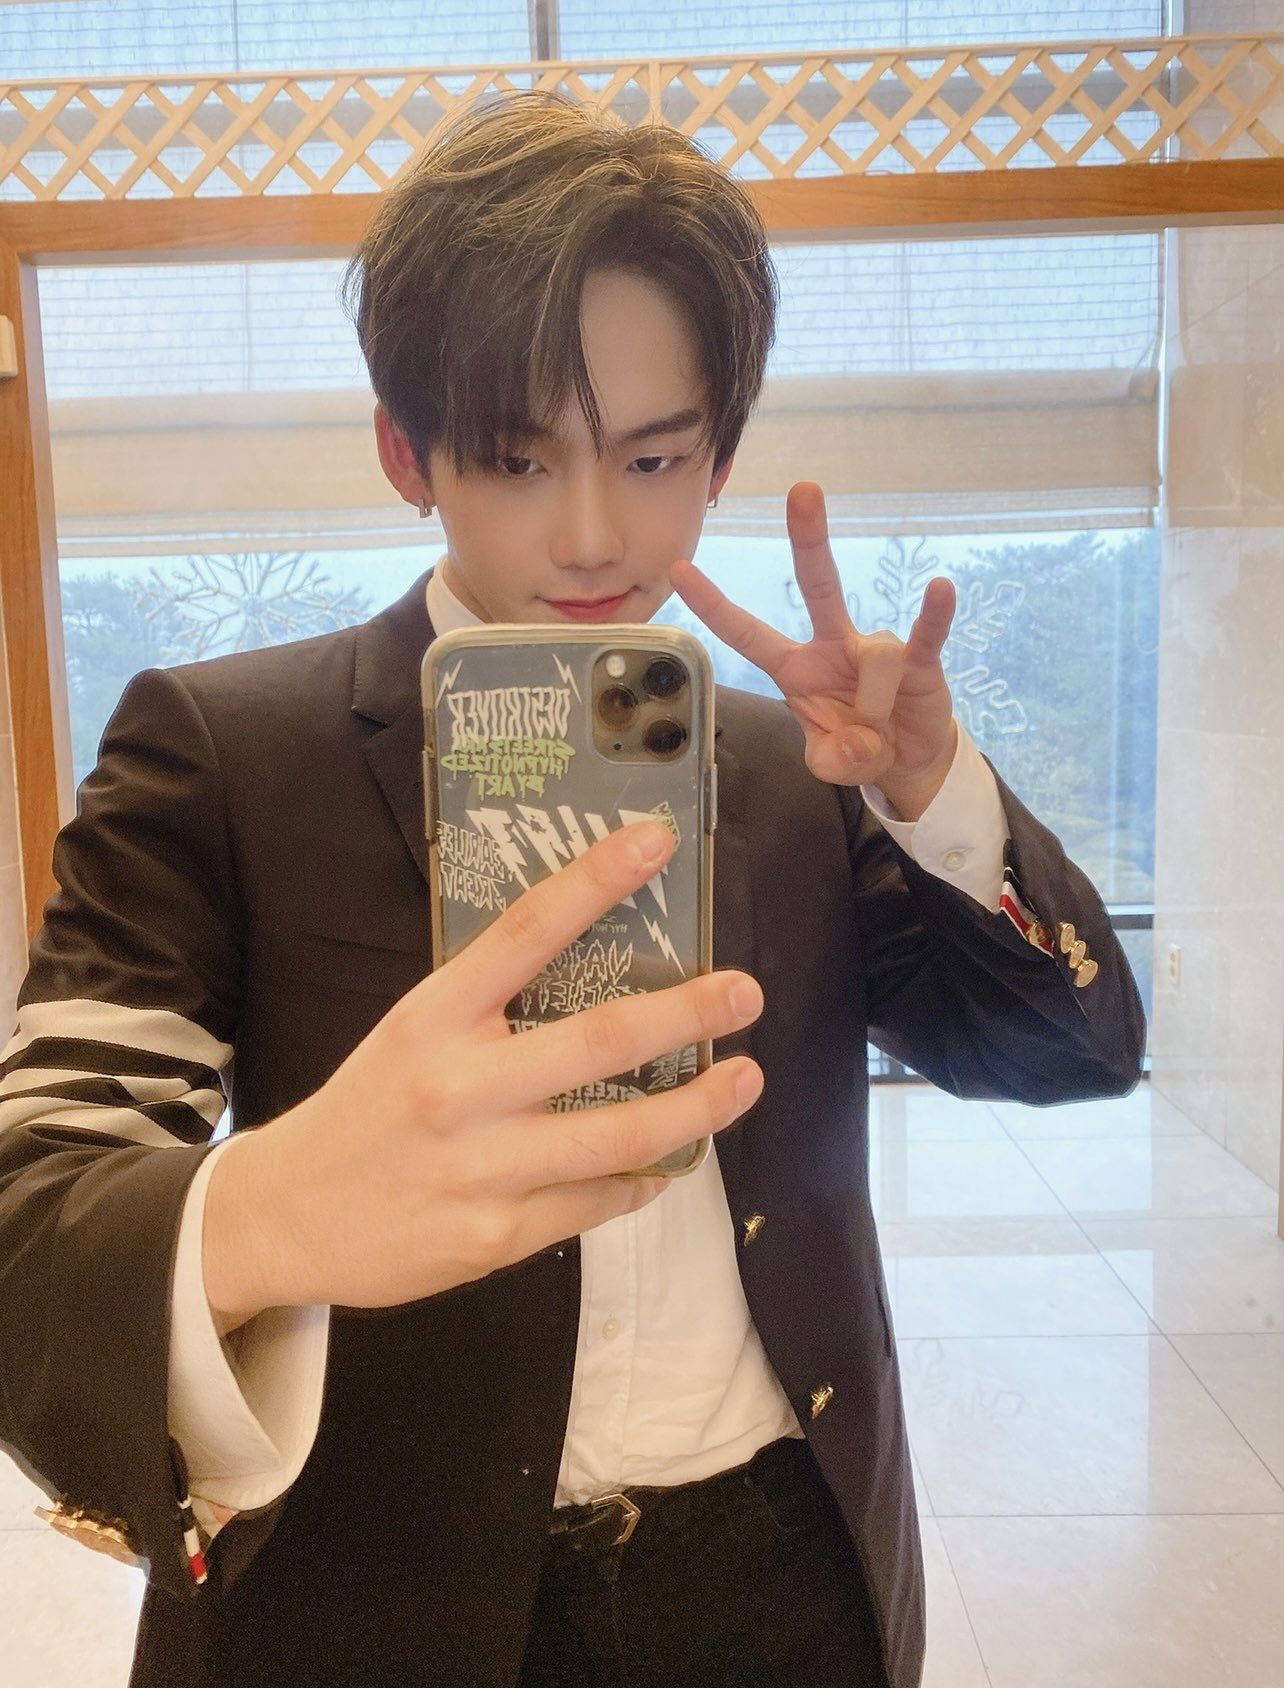 hyunsuk now